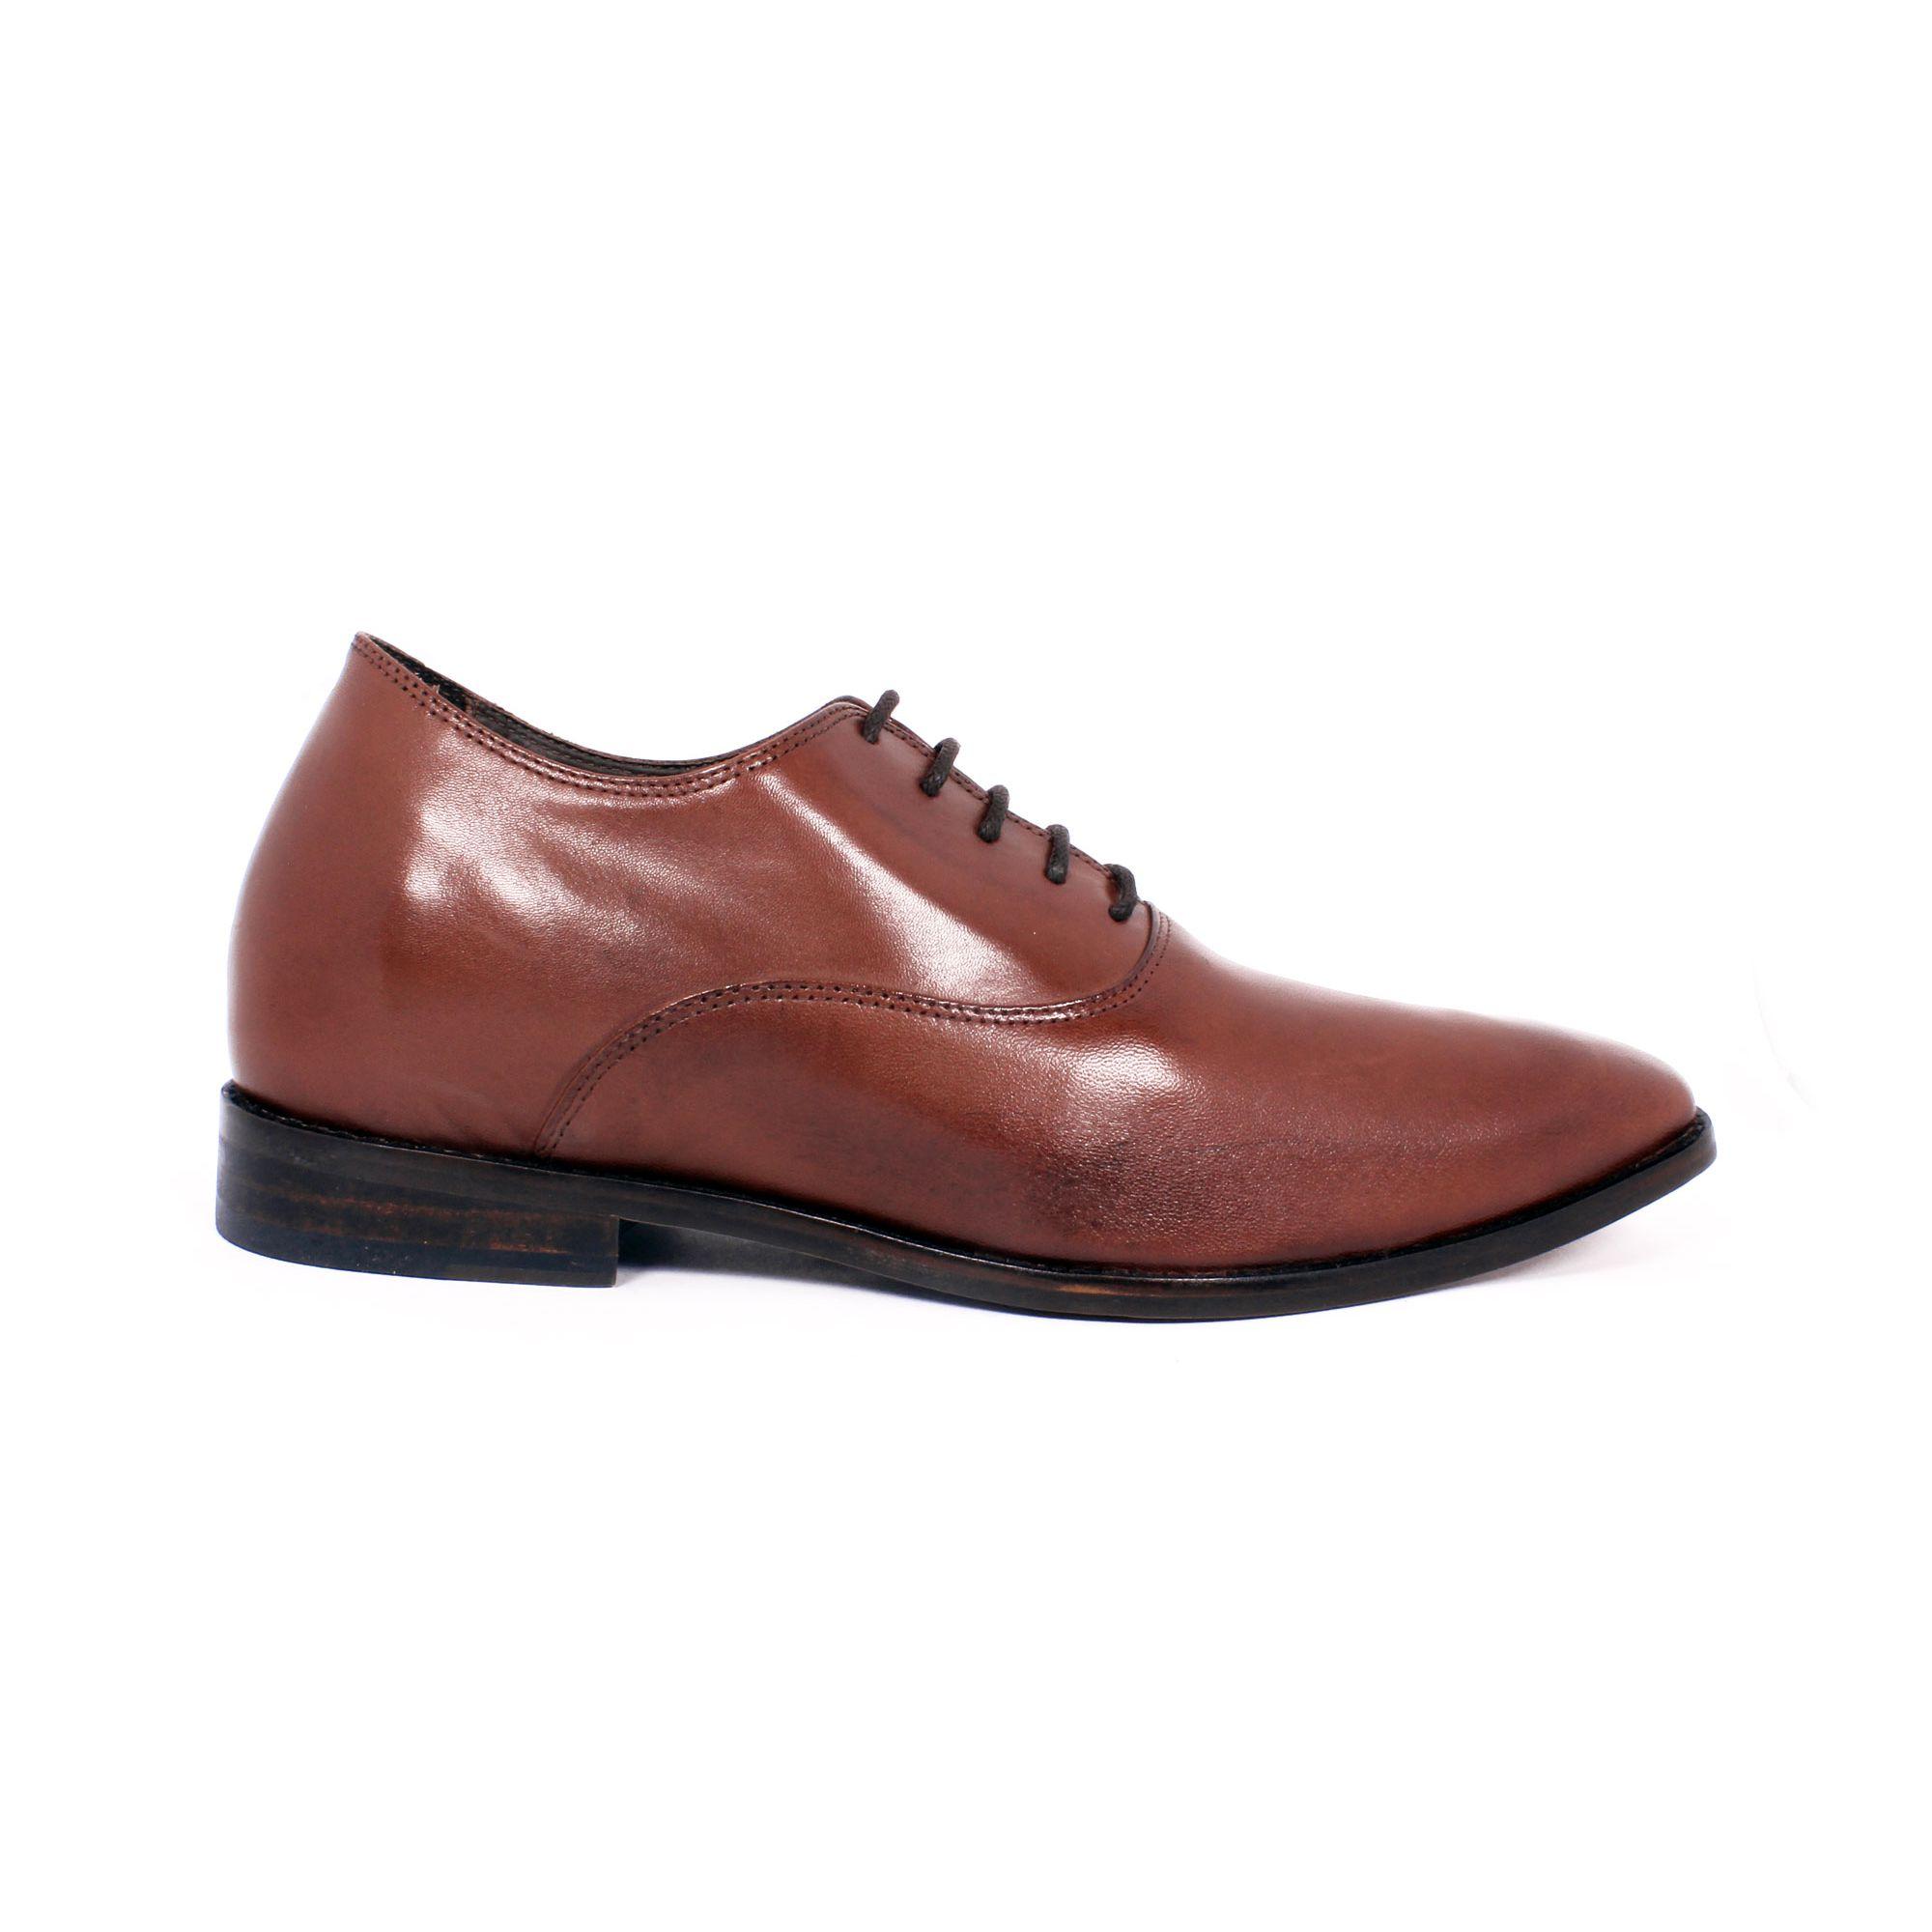 Zapato Formal Elegant Café Max Denegri +7cms de Altura_70805